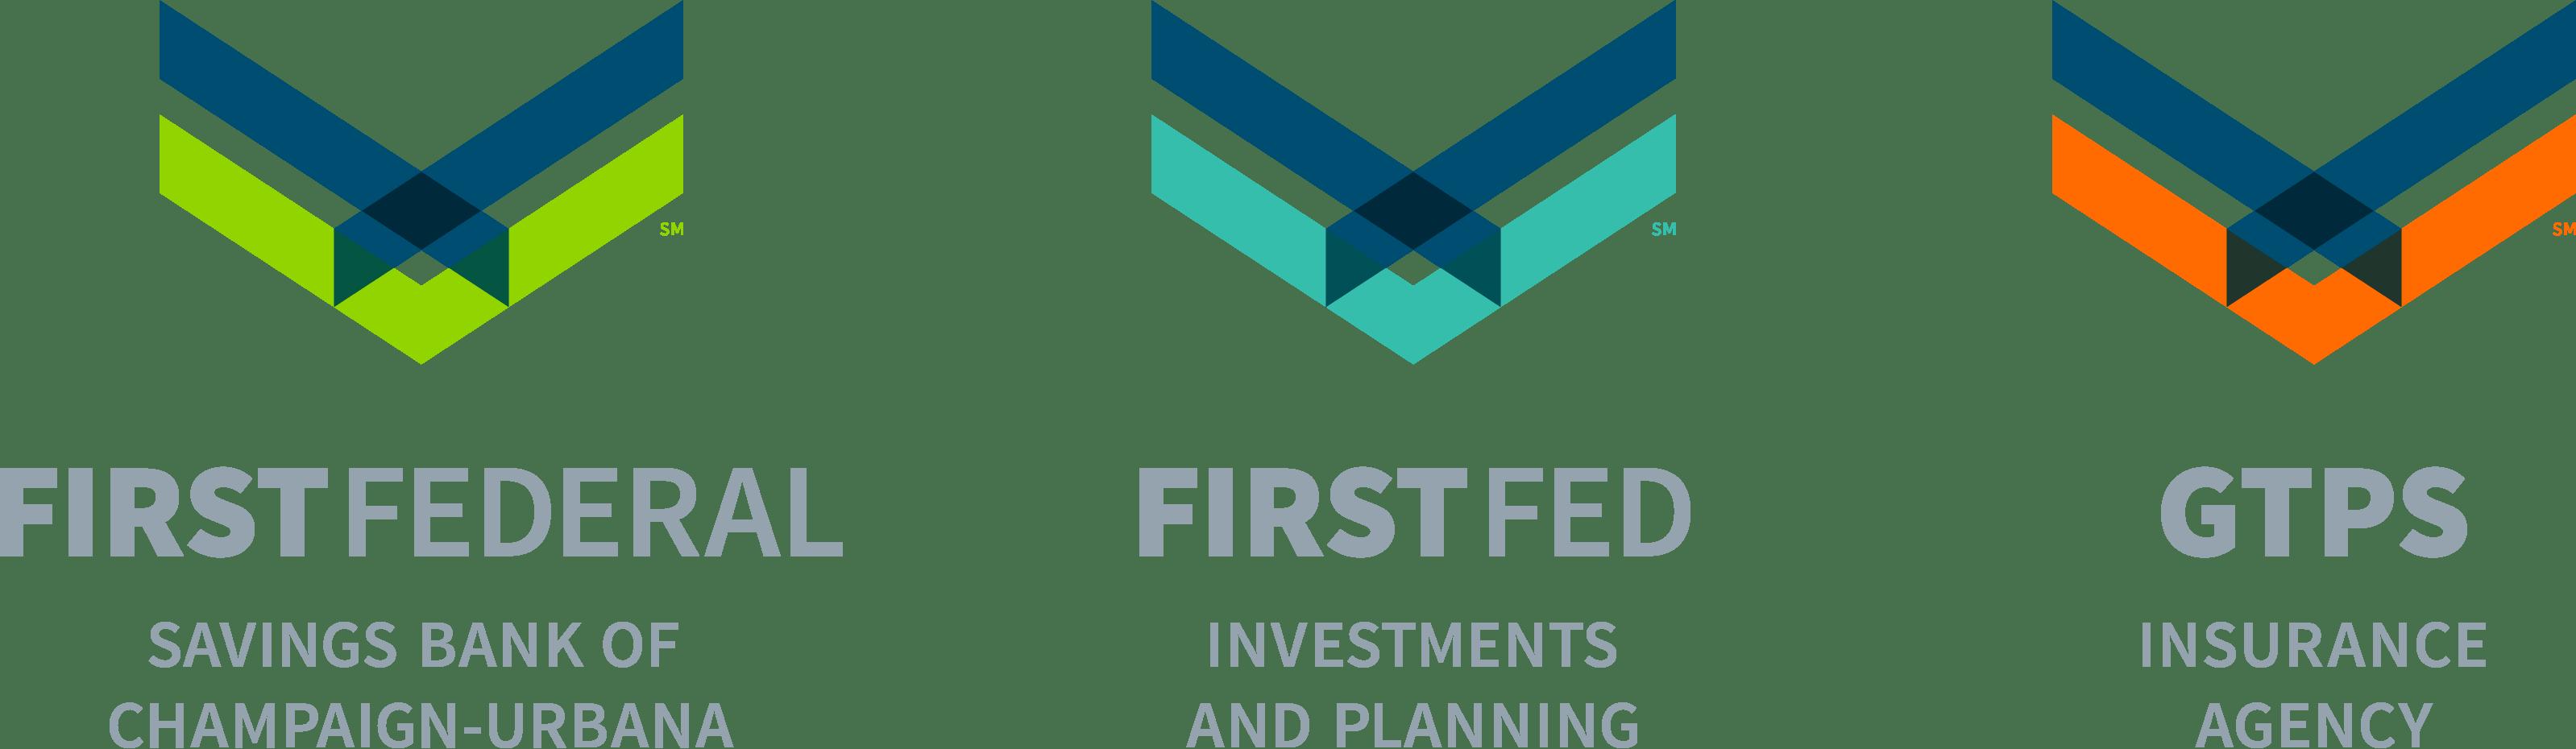 First Federal Savings Bank of Champaign-Urbana